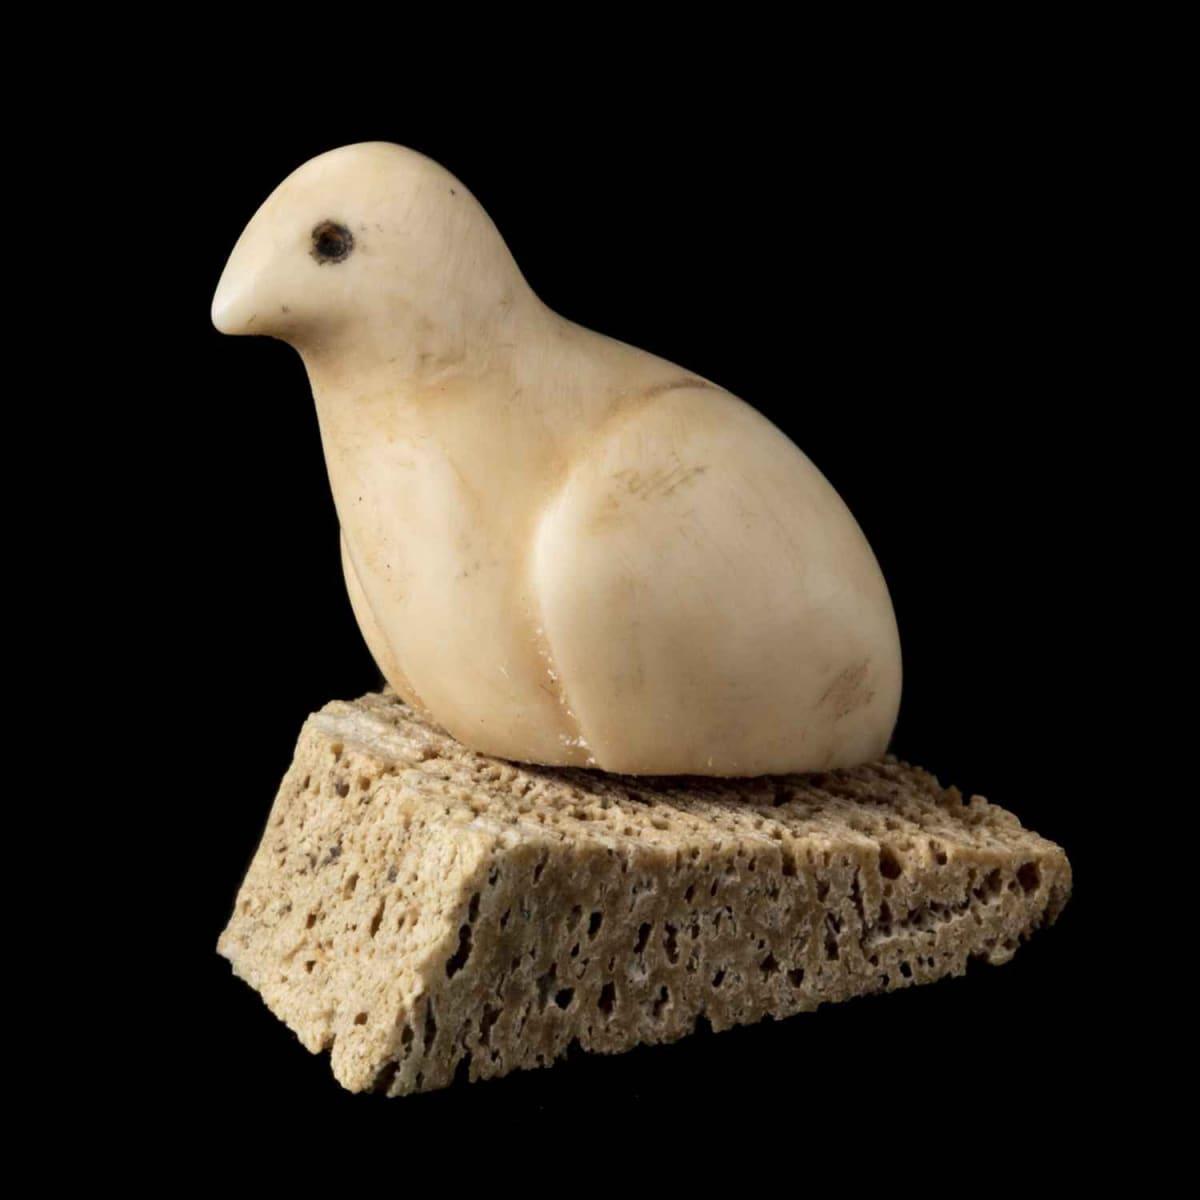 46. UNIDENTIFIED ARTIST, KUGAARUK (PELLY BAY) Bird, 1971